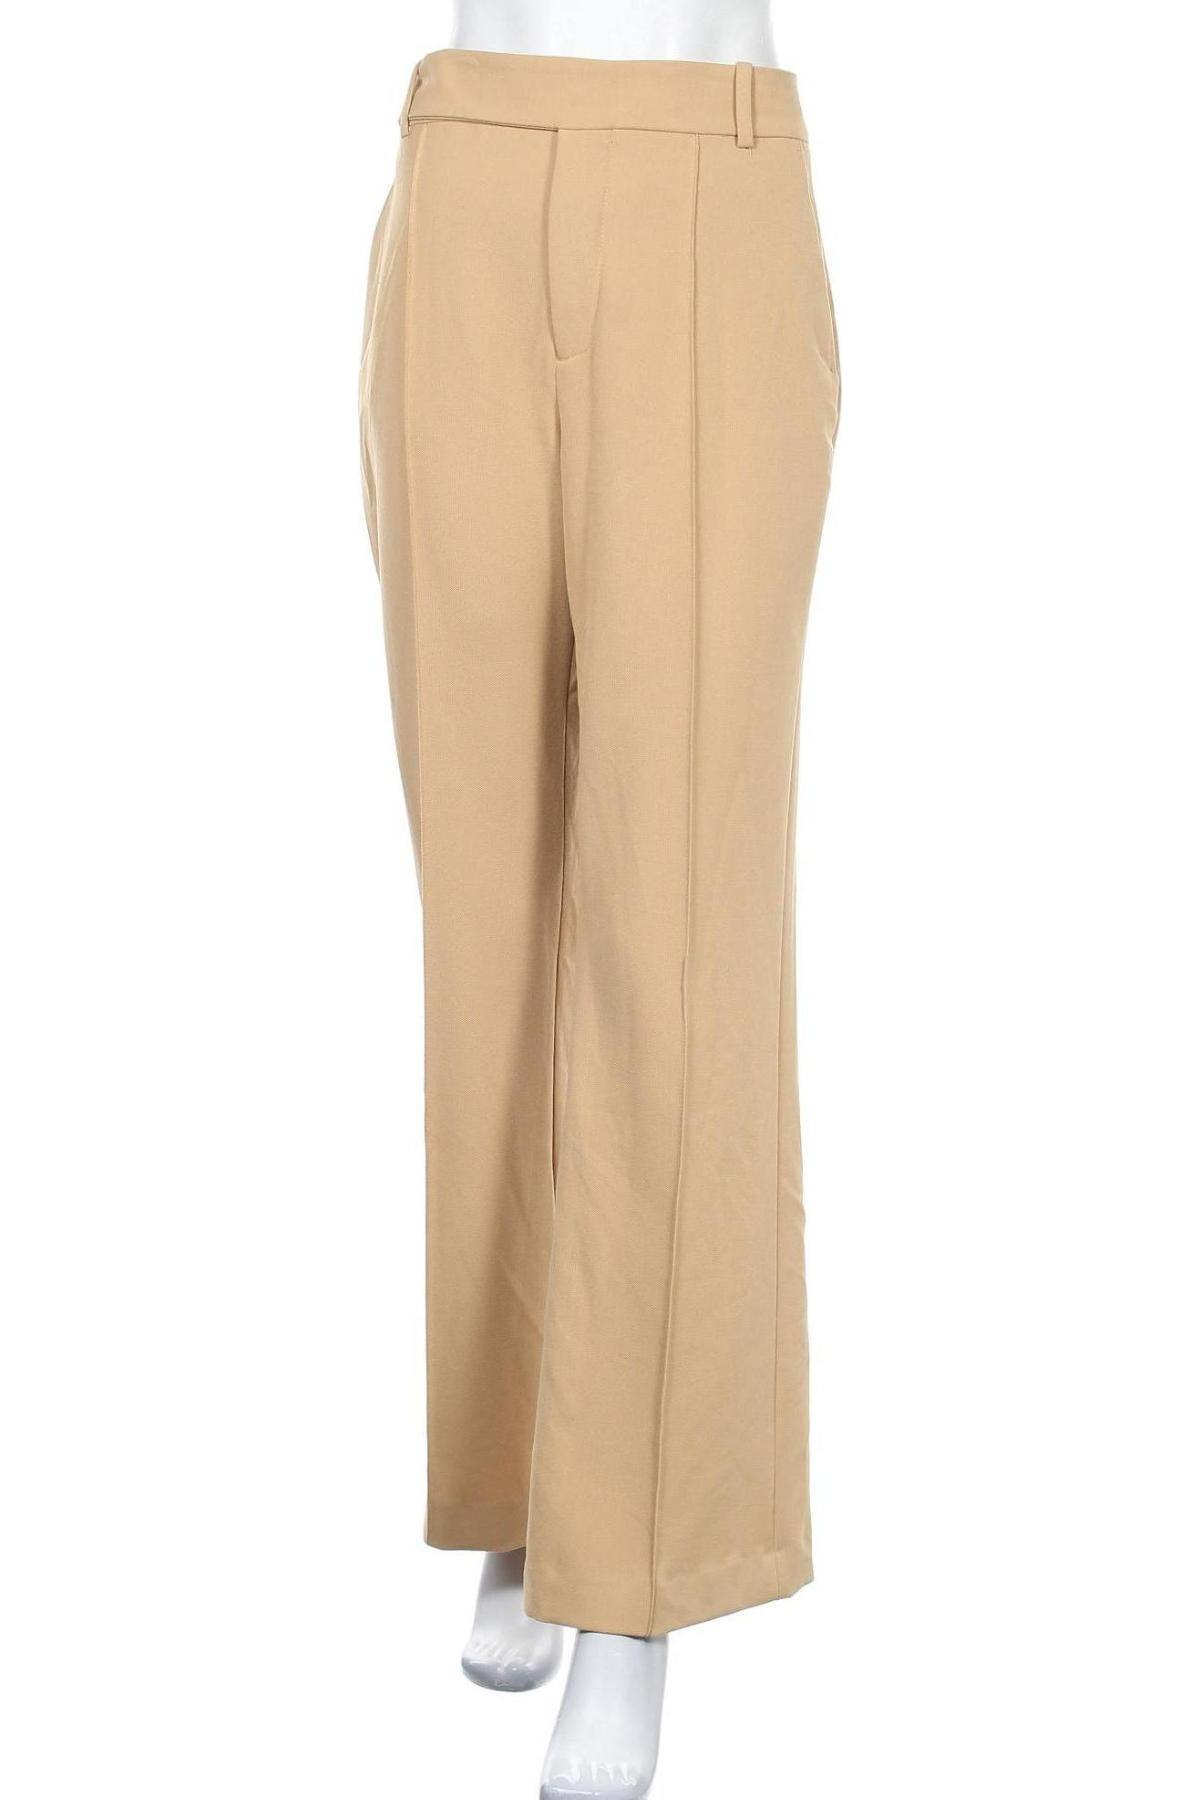 Дамски панталон Zara, Размер L, Цвят Бежов, 68% полиестер, 29% вискоза, 3% еластан, Цена 14,26лв.